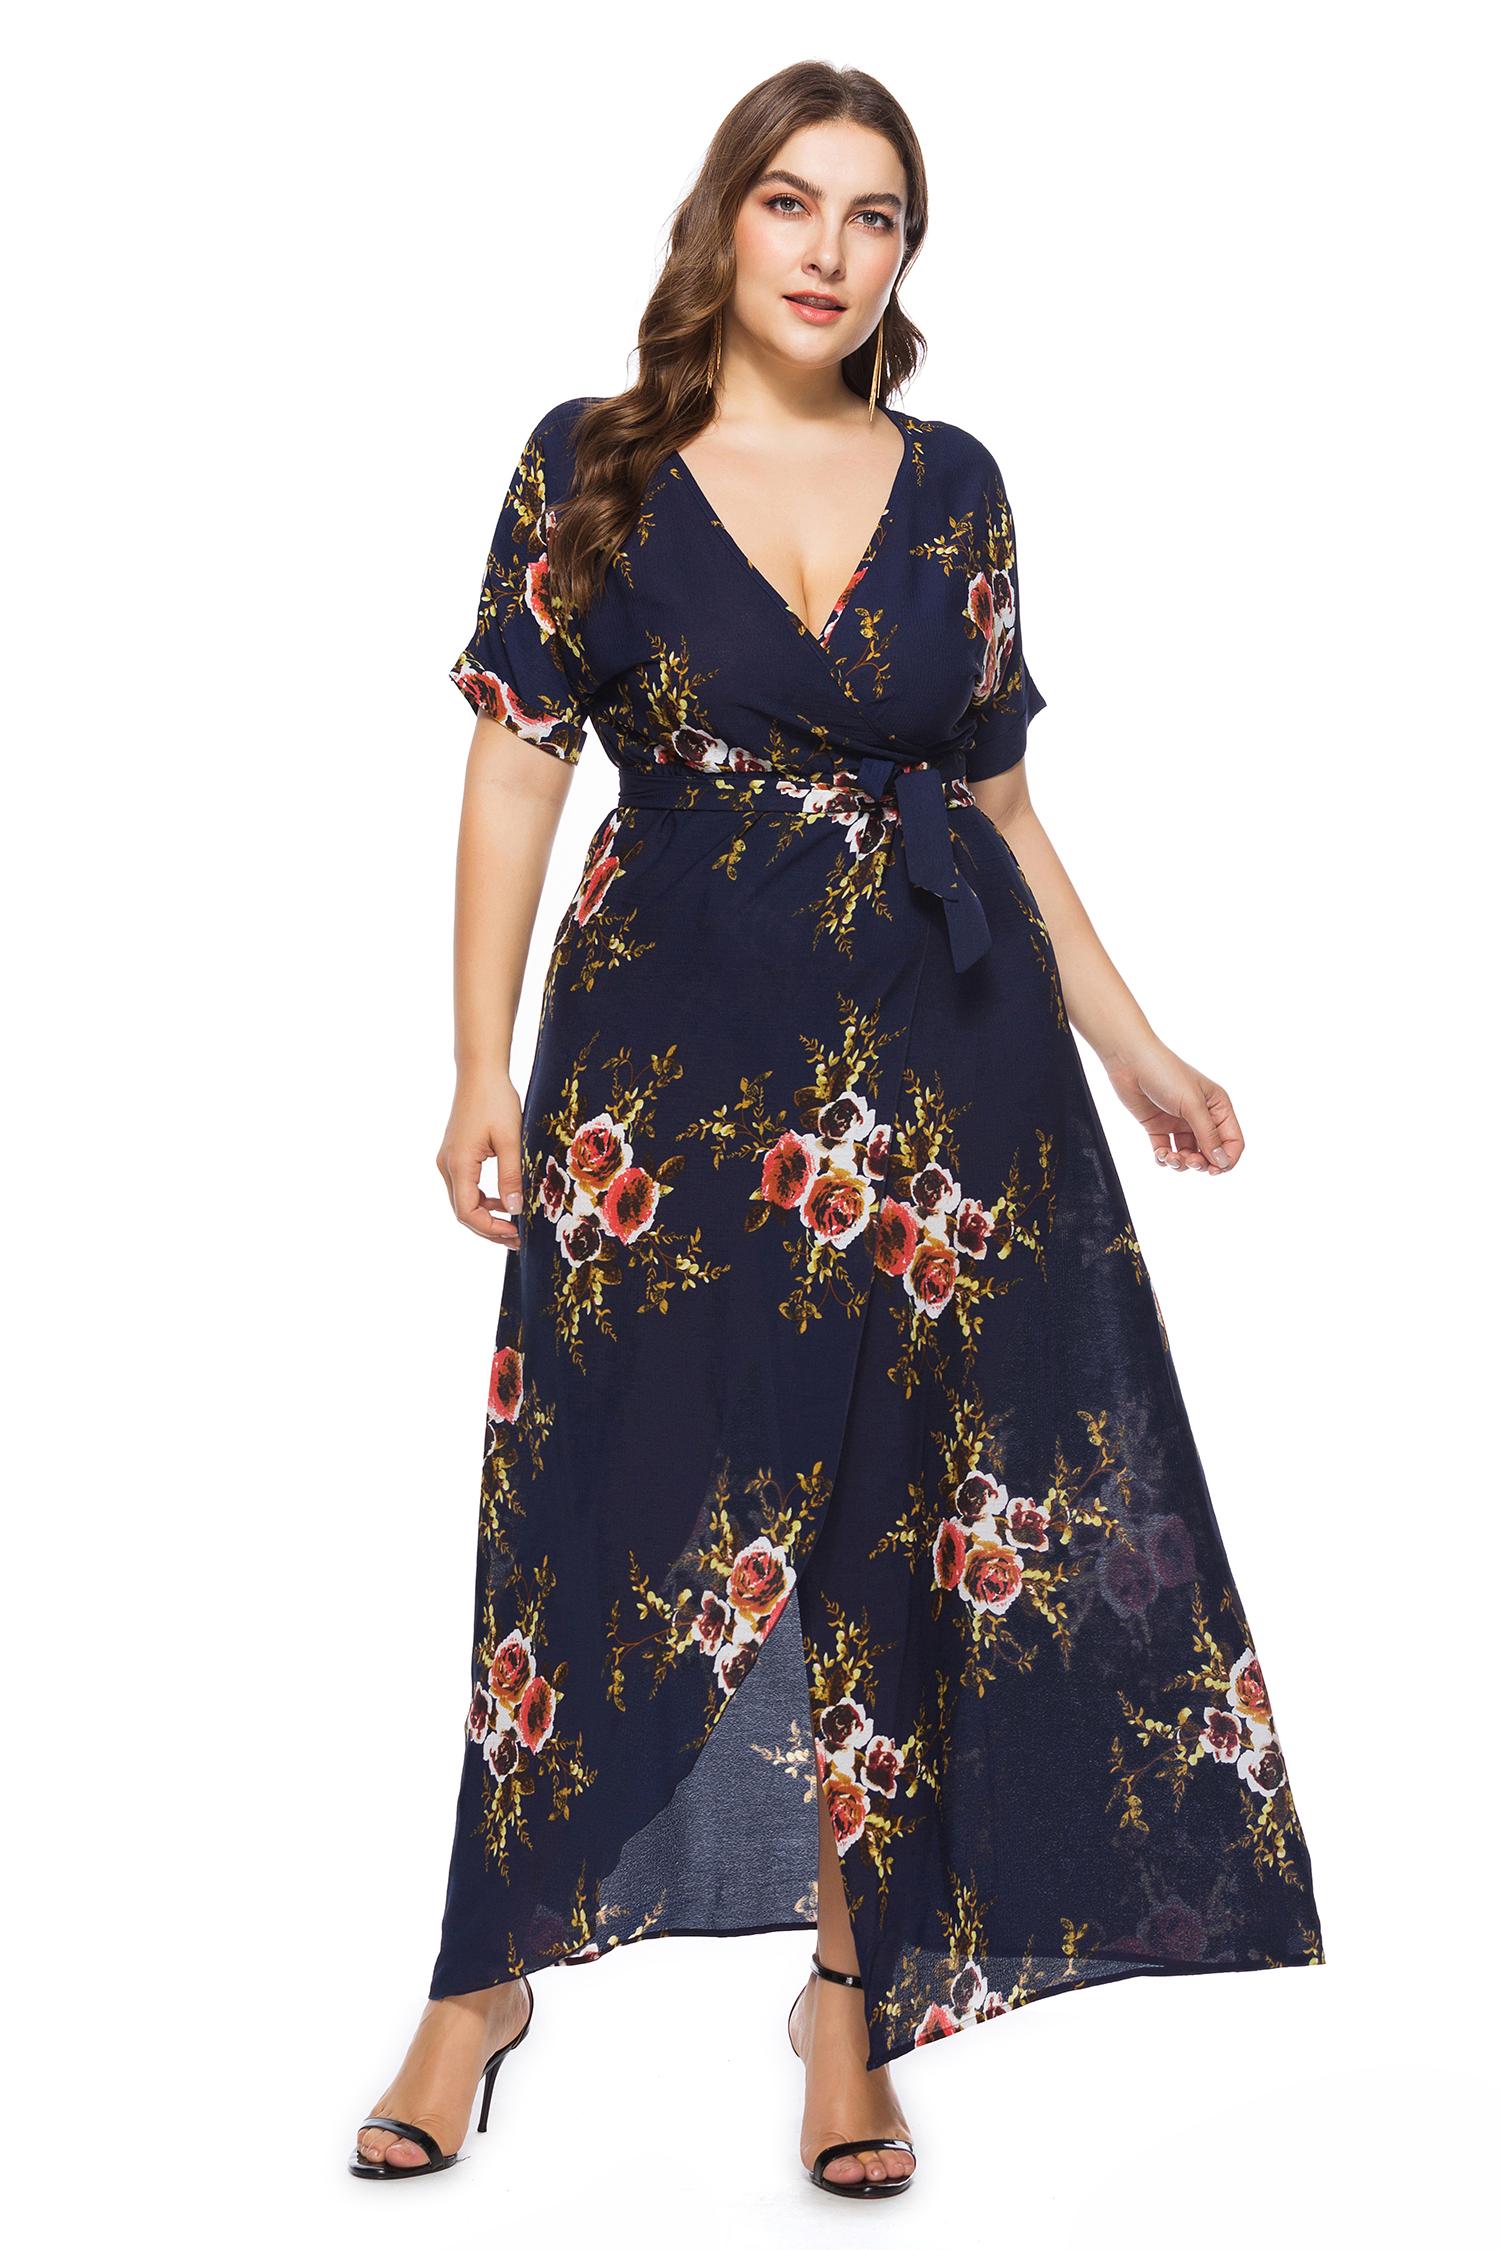 b67272dc04 US$ 12.35 - Plus Size Short Sleeve Floral Wrap Maxi Dress -  www.global-lover.com